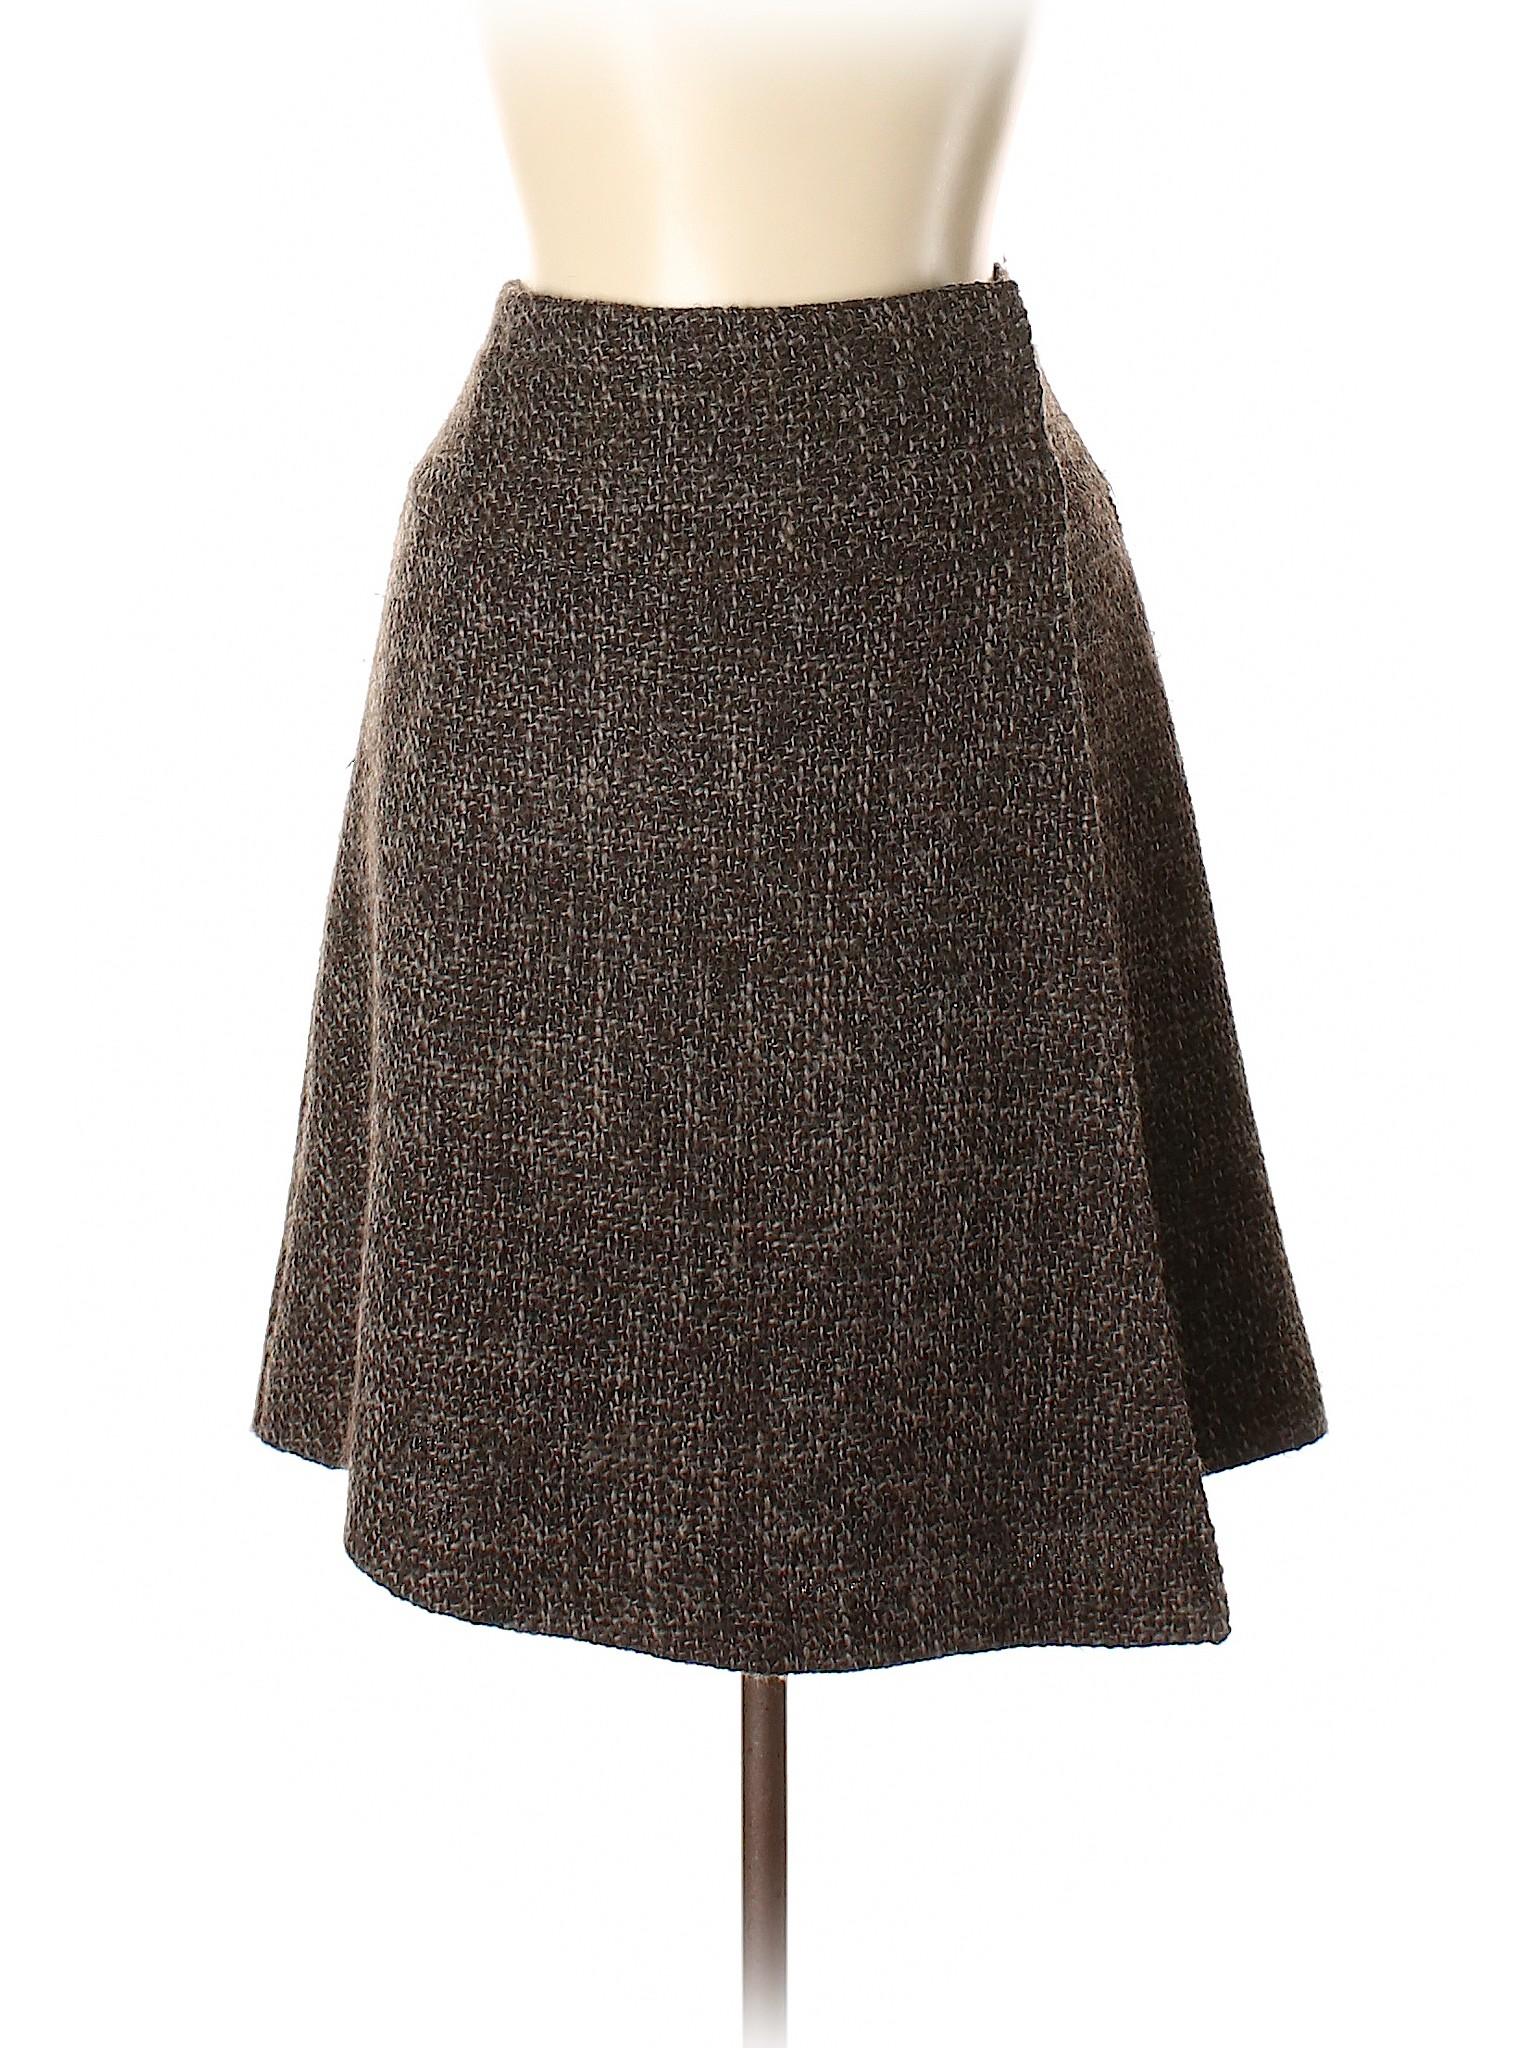 Boutique Casual Boutique Boutique Skirt Casual Skirt Skirt Casual Boutique PPqBwg